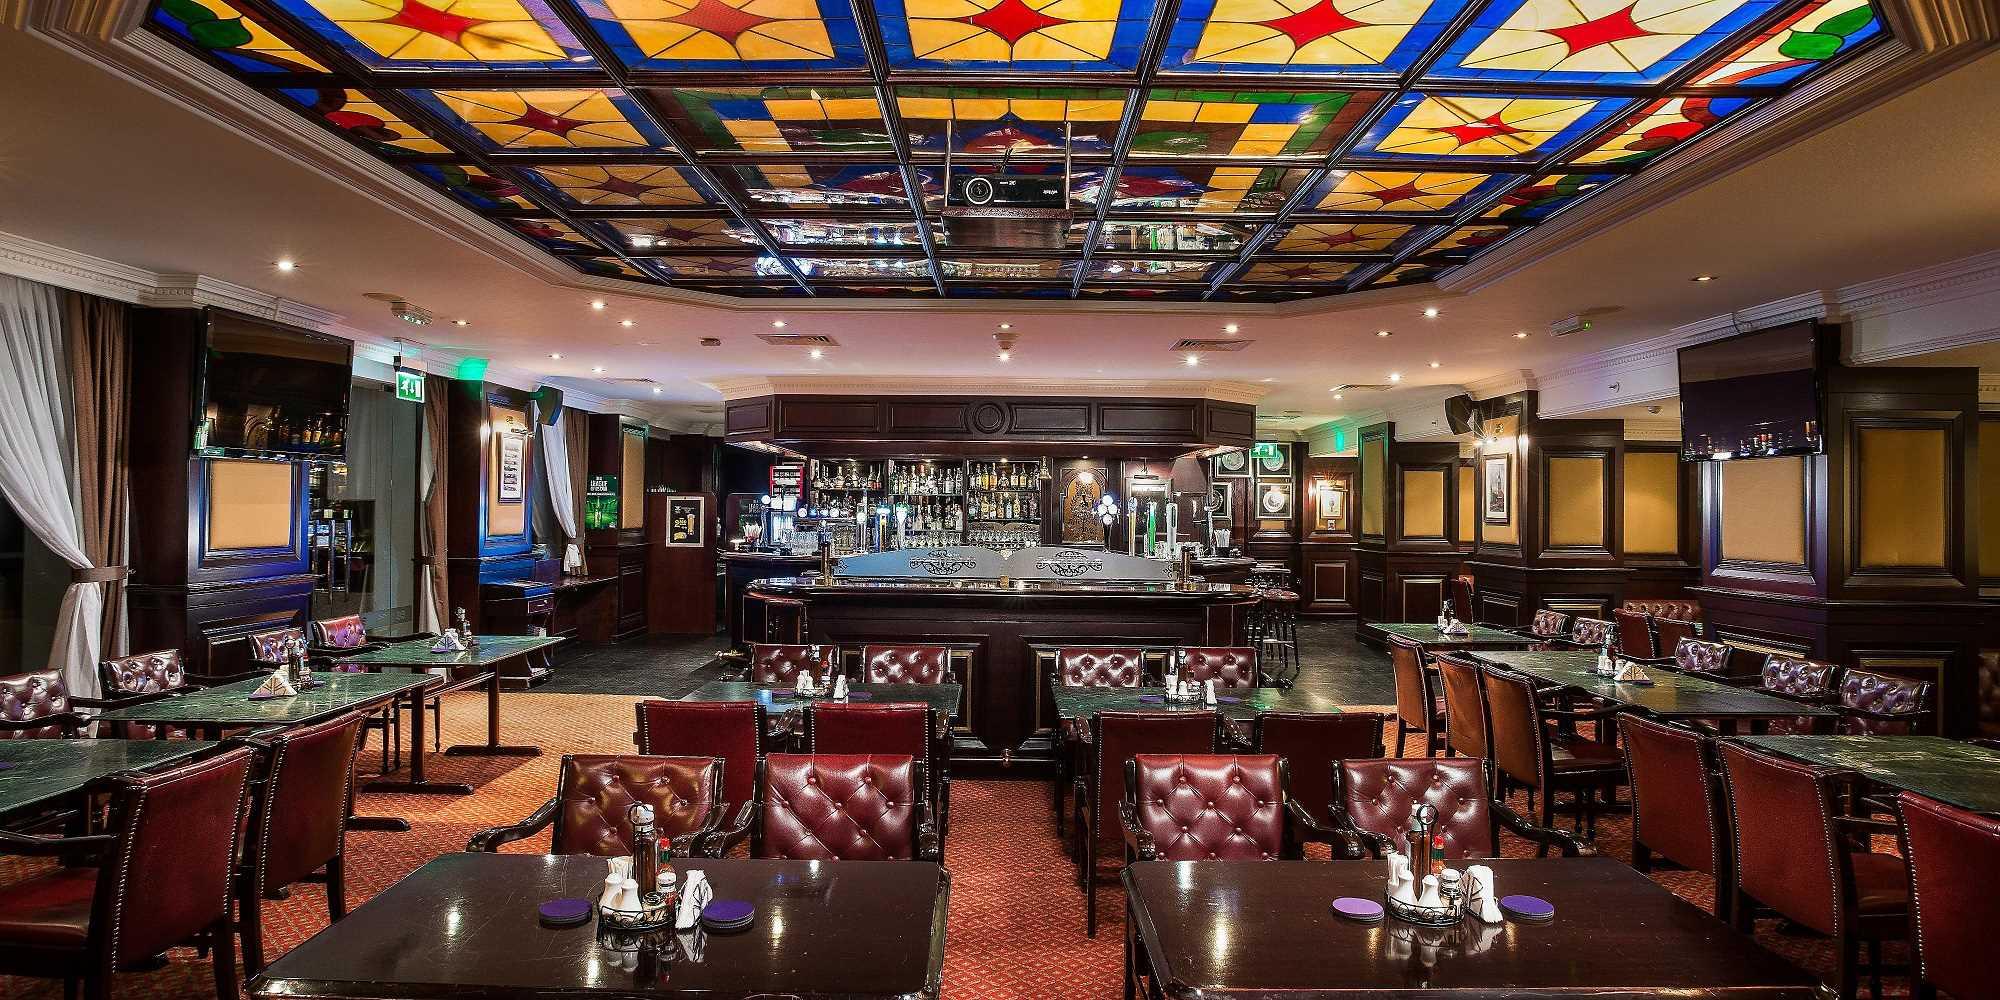 Crowne Plaza Muscat Restaurant